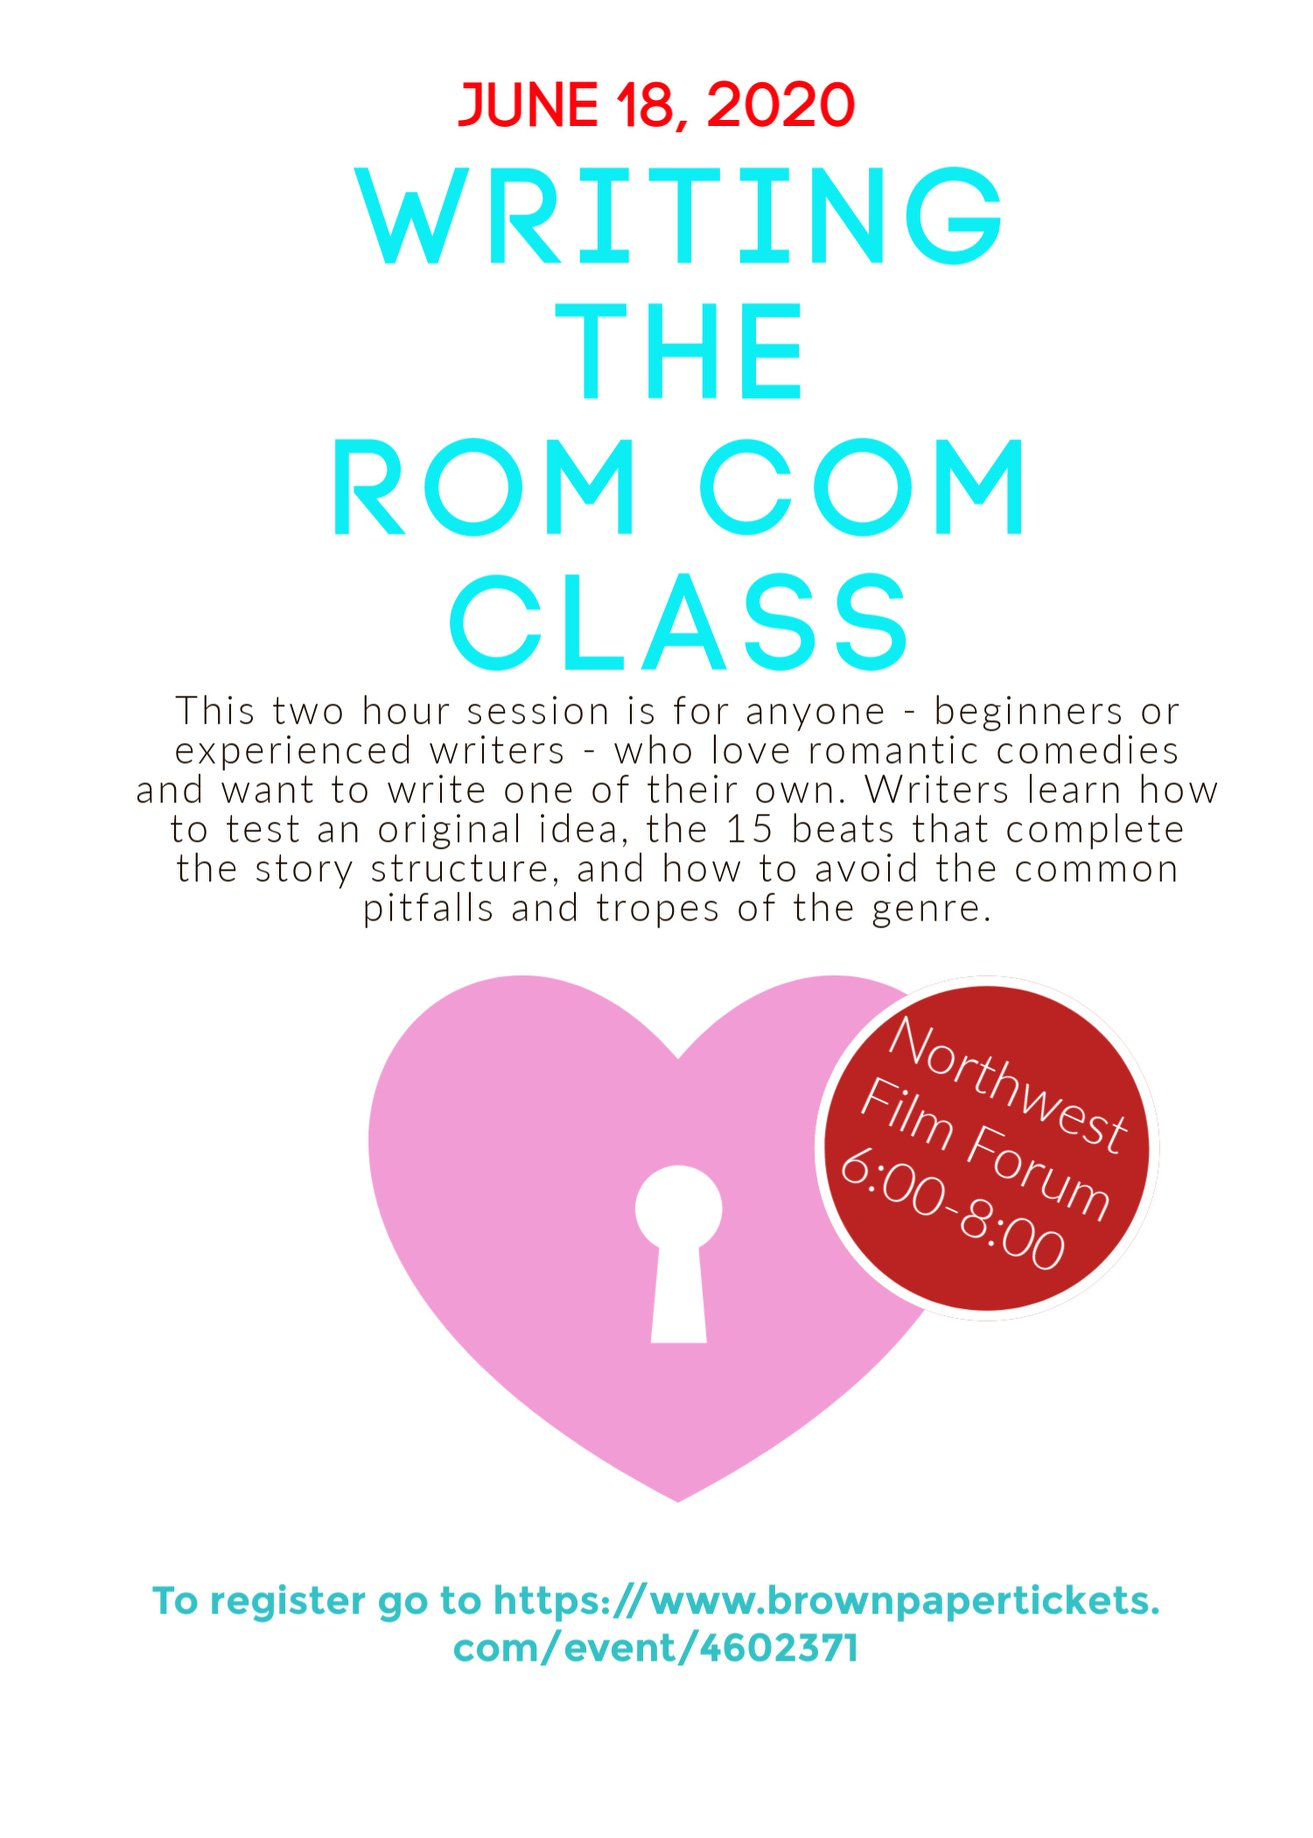 writing the rom com class flyer